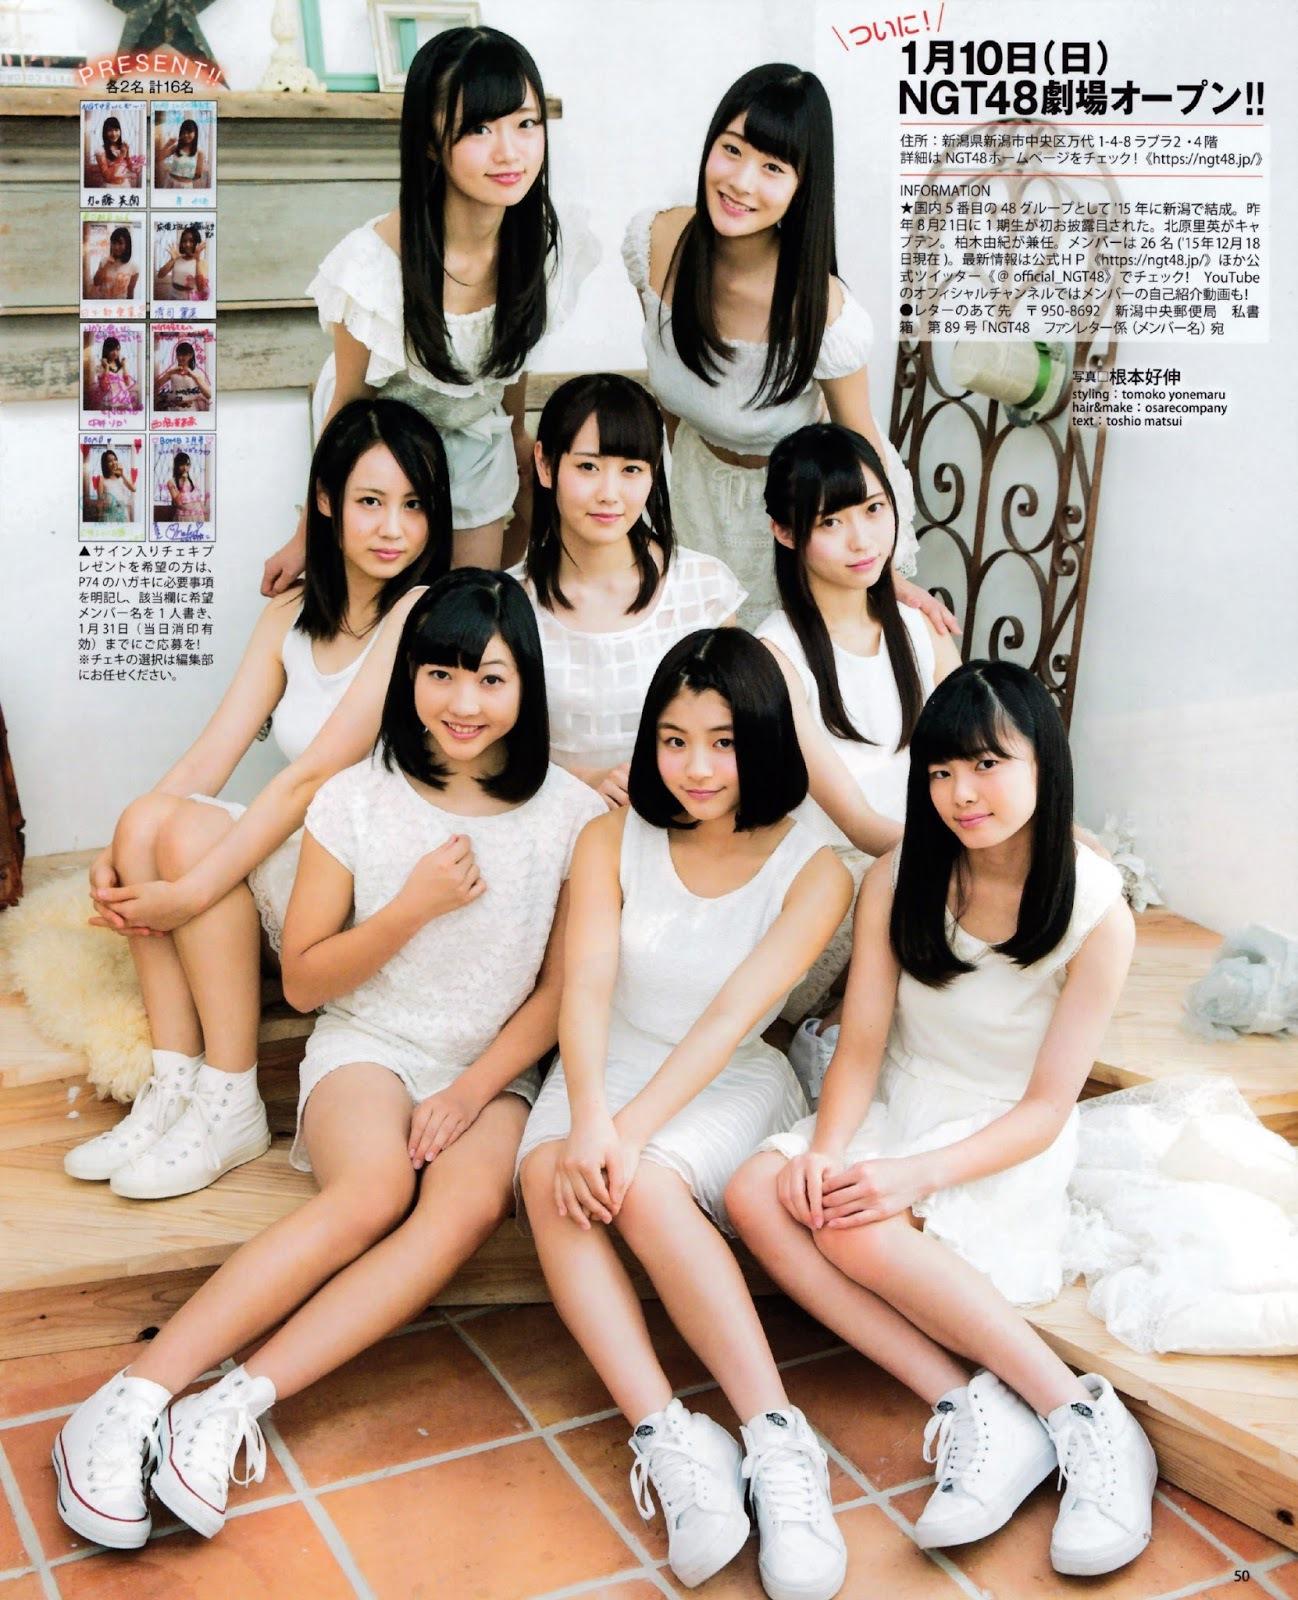 NGT48の画像 p1_37